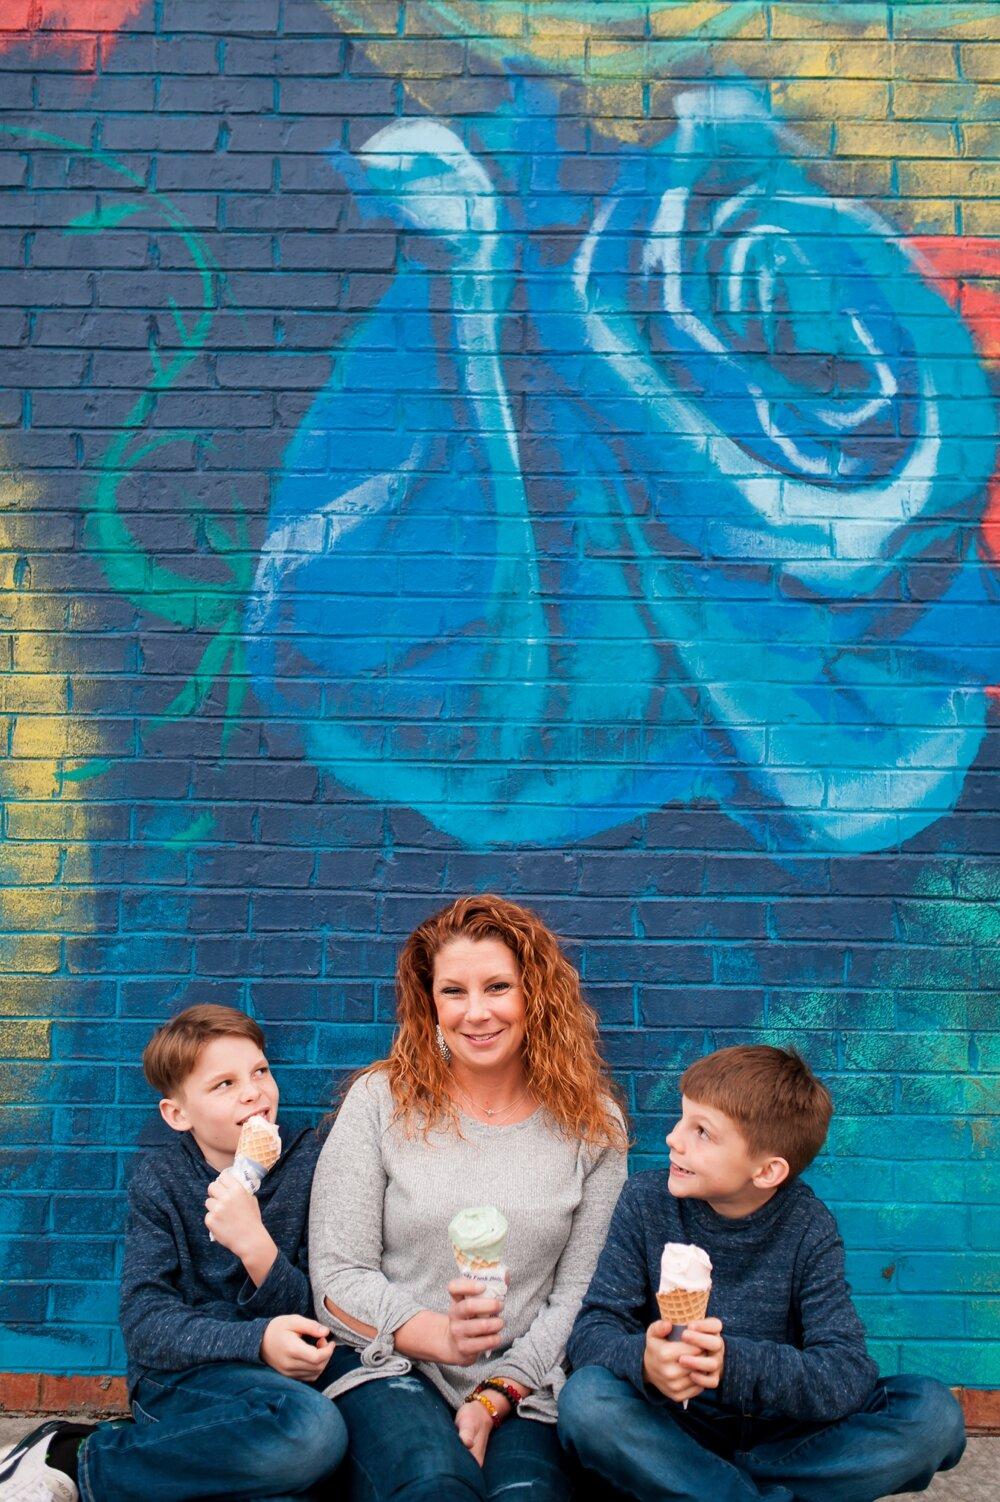 Jodi-Trent-Drake-Family-Session-Indy-Family-Photo_0044.jpg